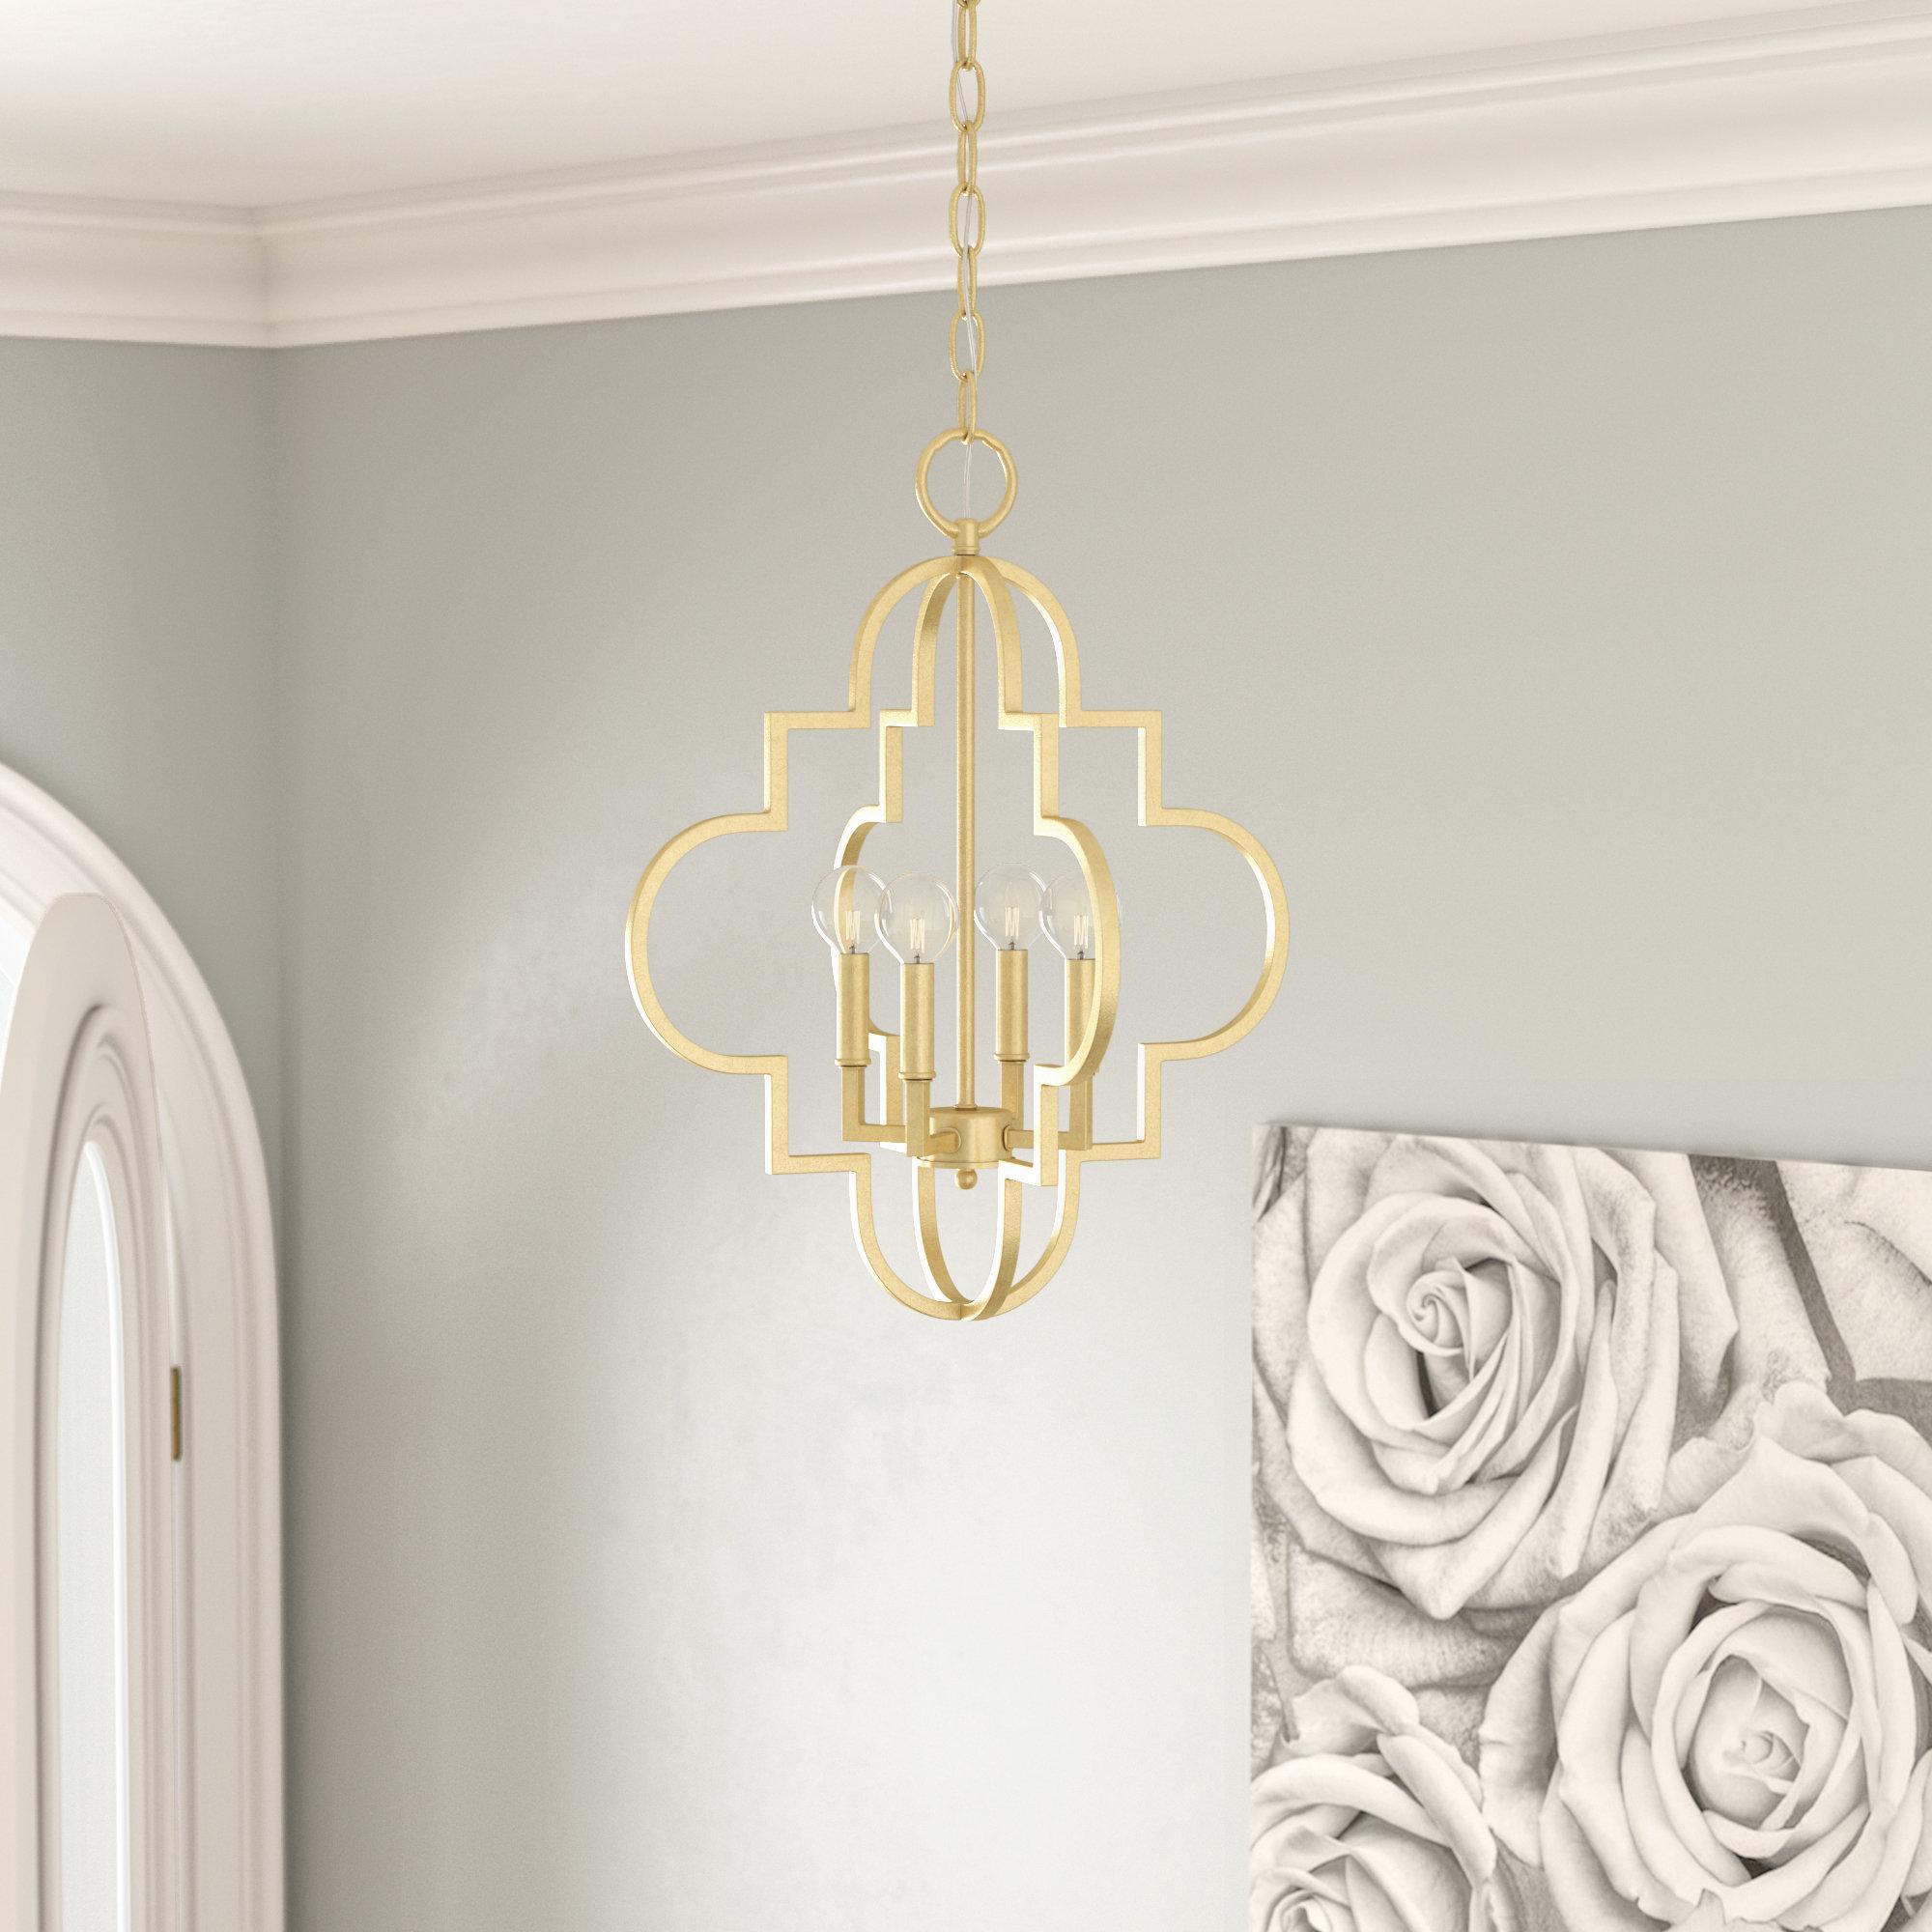 Featured Photo of Reidar 4 Light Geometric Chandeliers